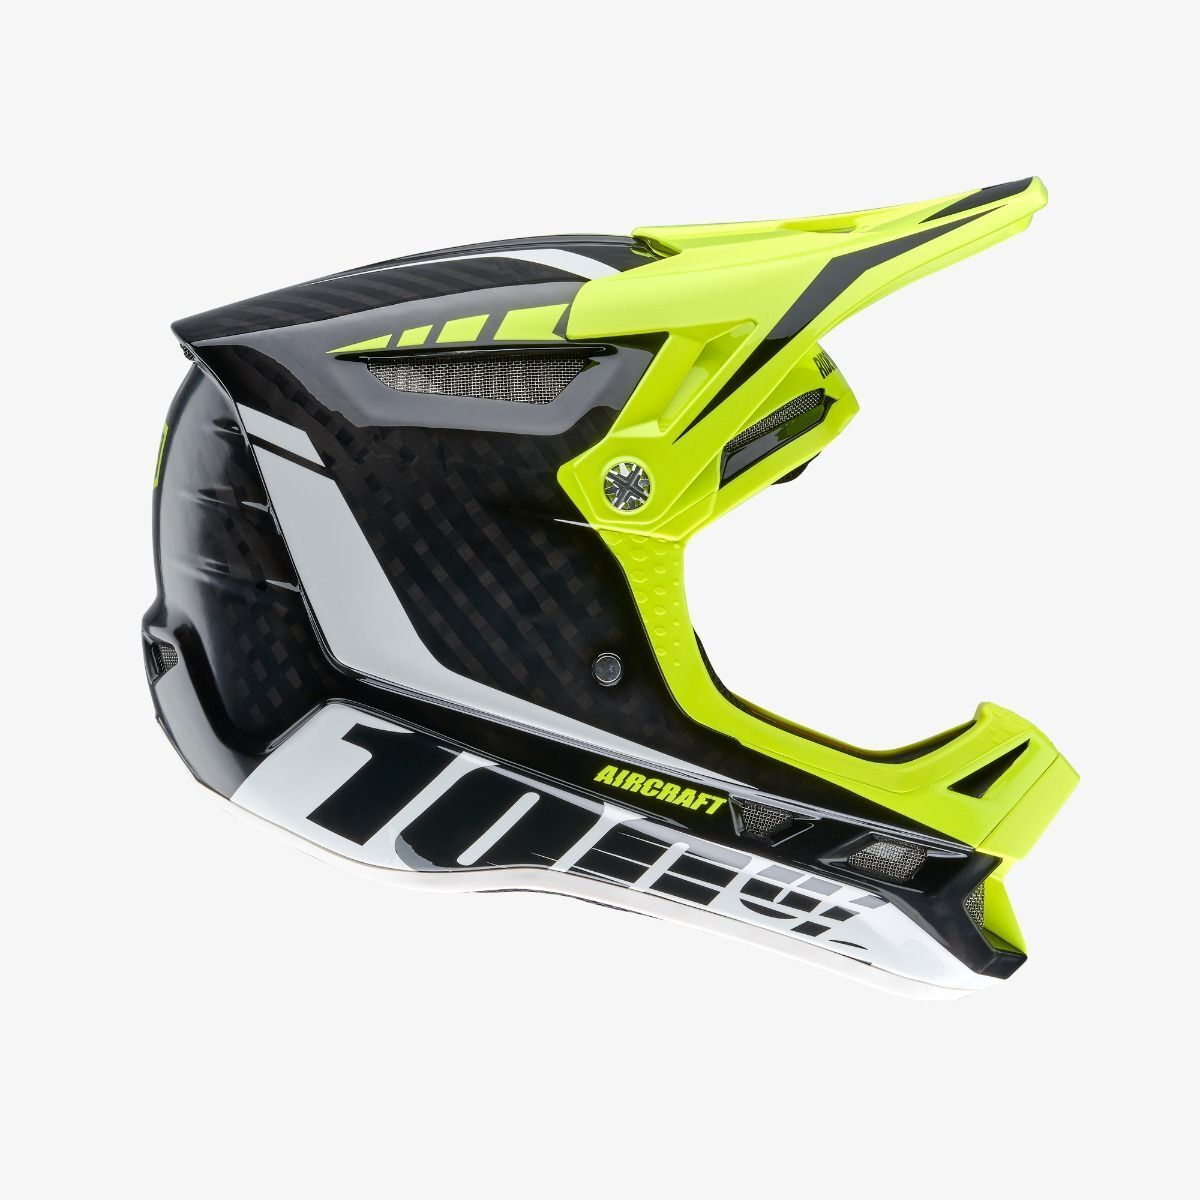 100%AIRCRAFT DH Helmet MIPS  Demo  MD